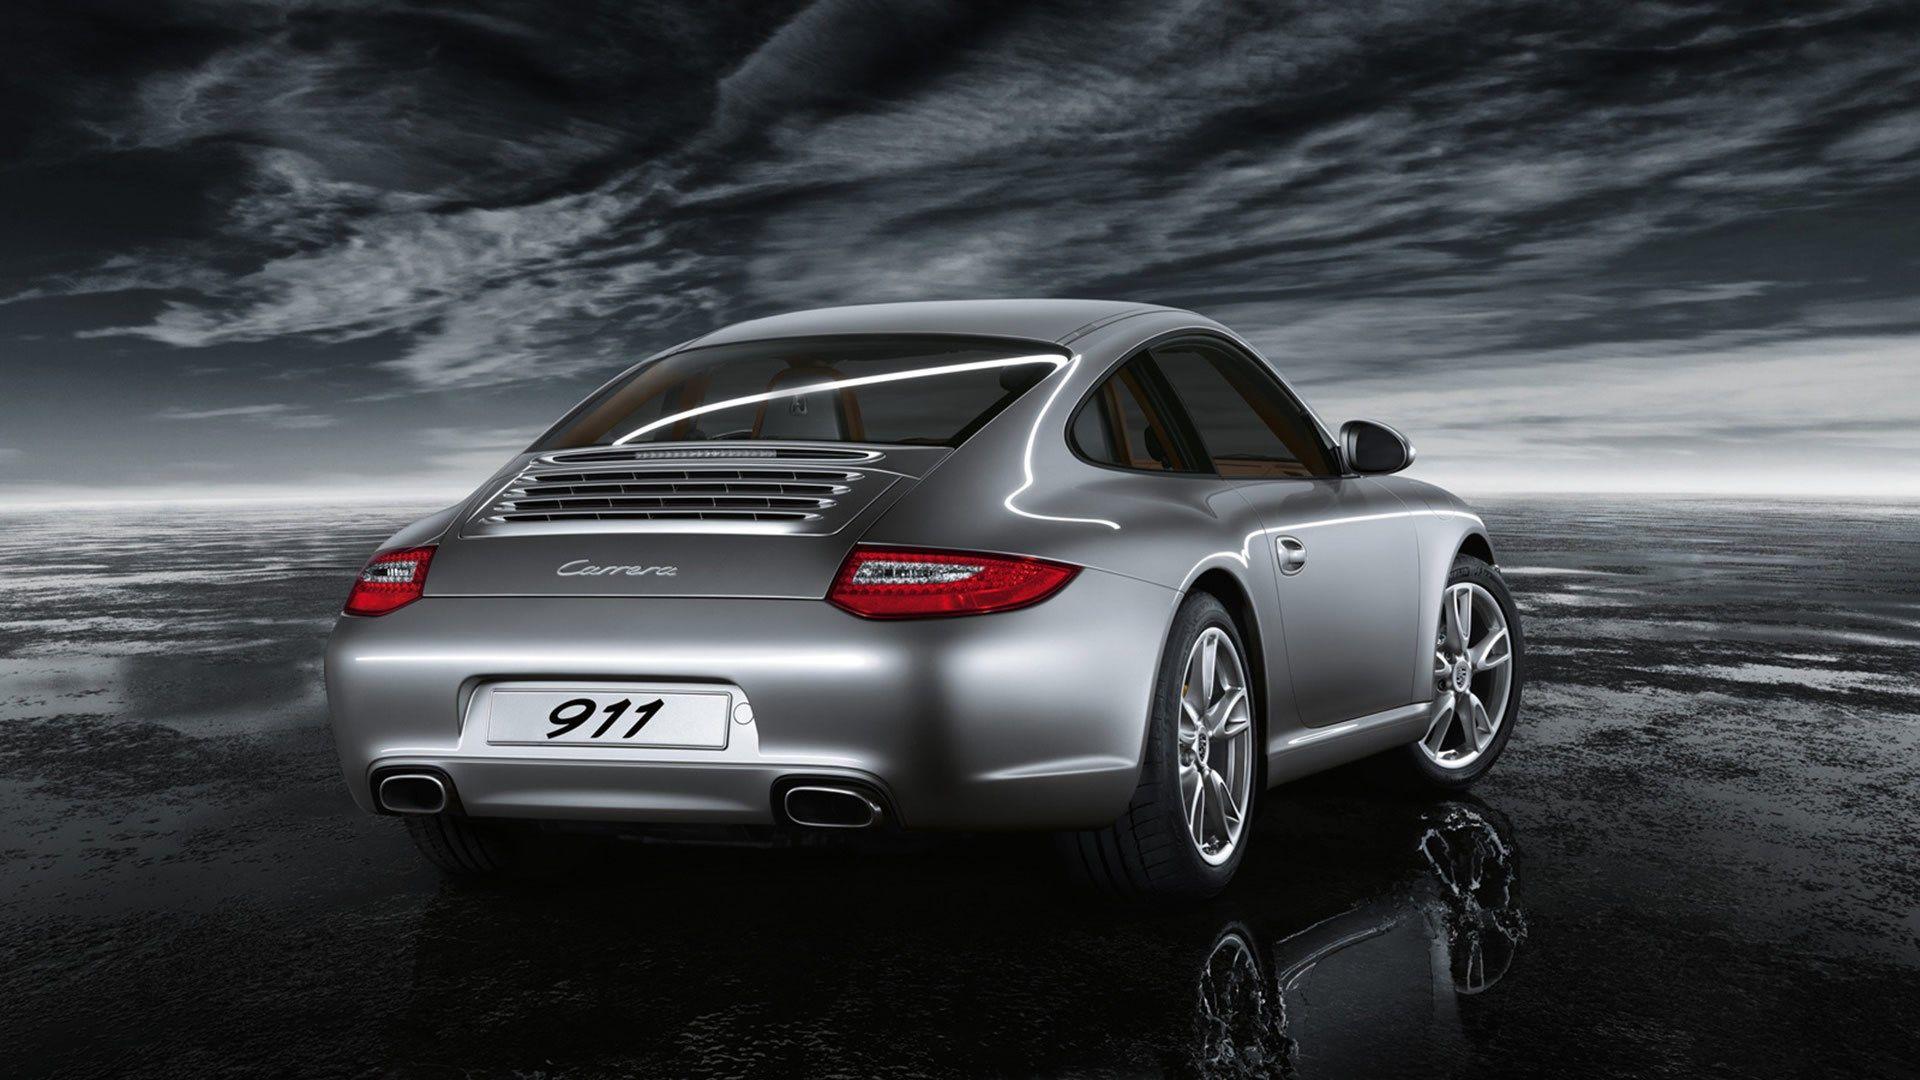 Porsche 1080p High Quality 1920x1080 Porsche 911 Carrera Porsche 911